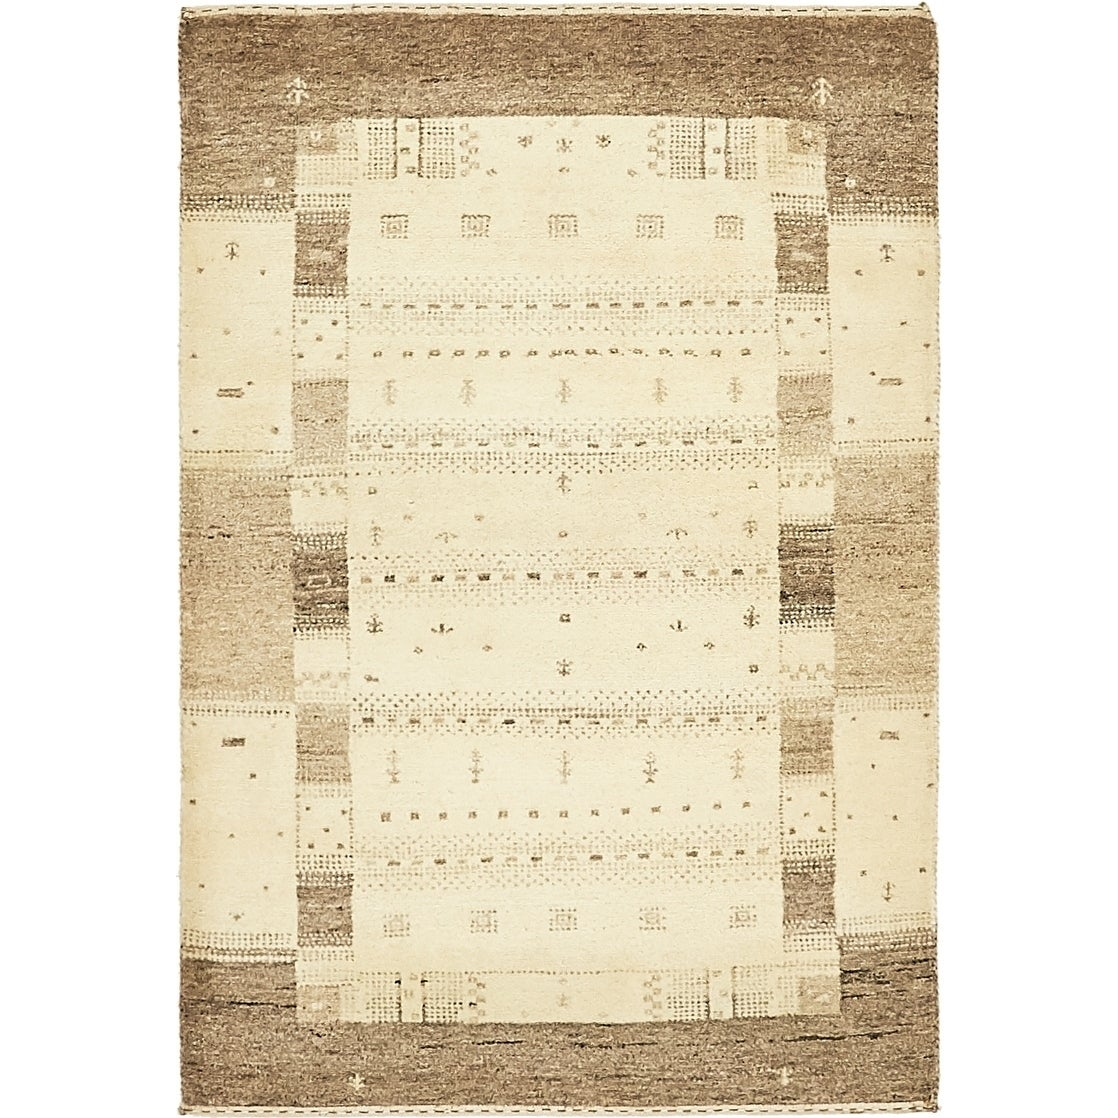 Hand Knotted Kashkuli Gabbeh Wool Area Rug - 3 x 4 4 (Cream - 3 x 4 4)